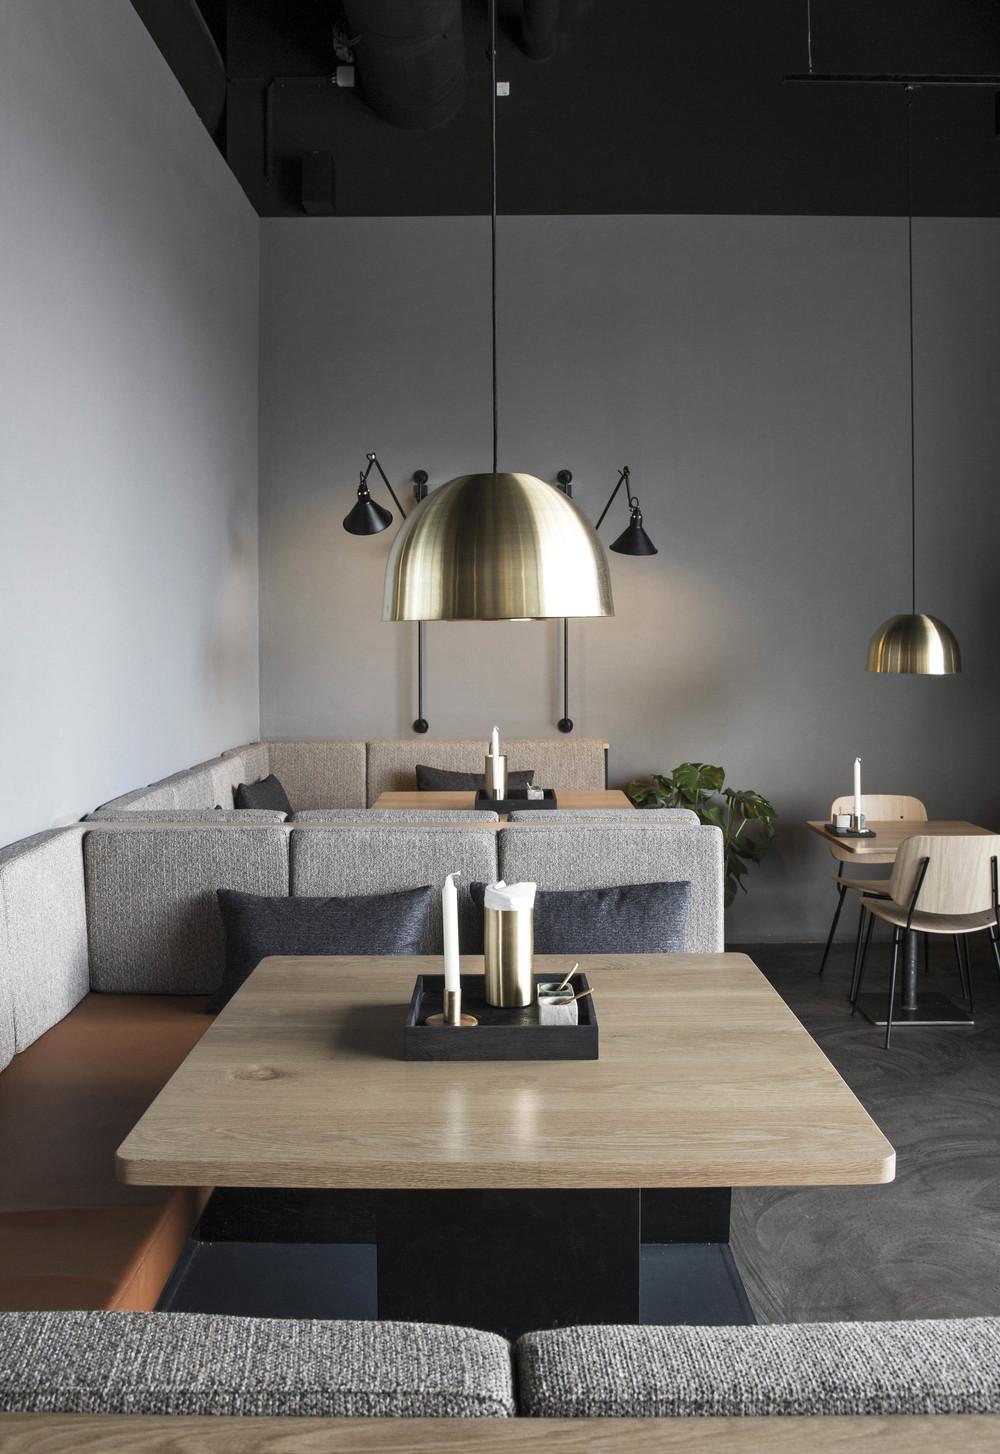 Interior design of Palæo restaurant in Copenhagen designed by Johannes Torpe Studios